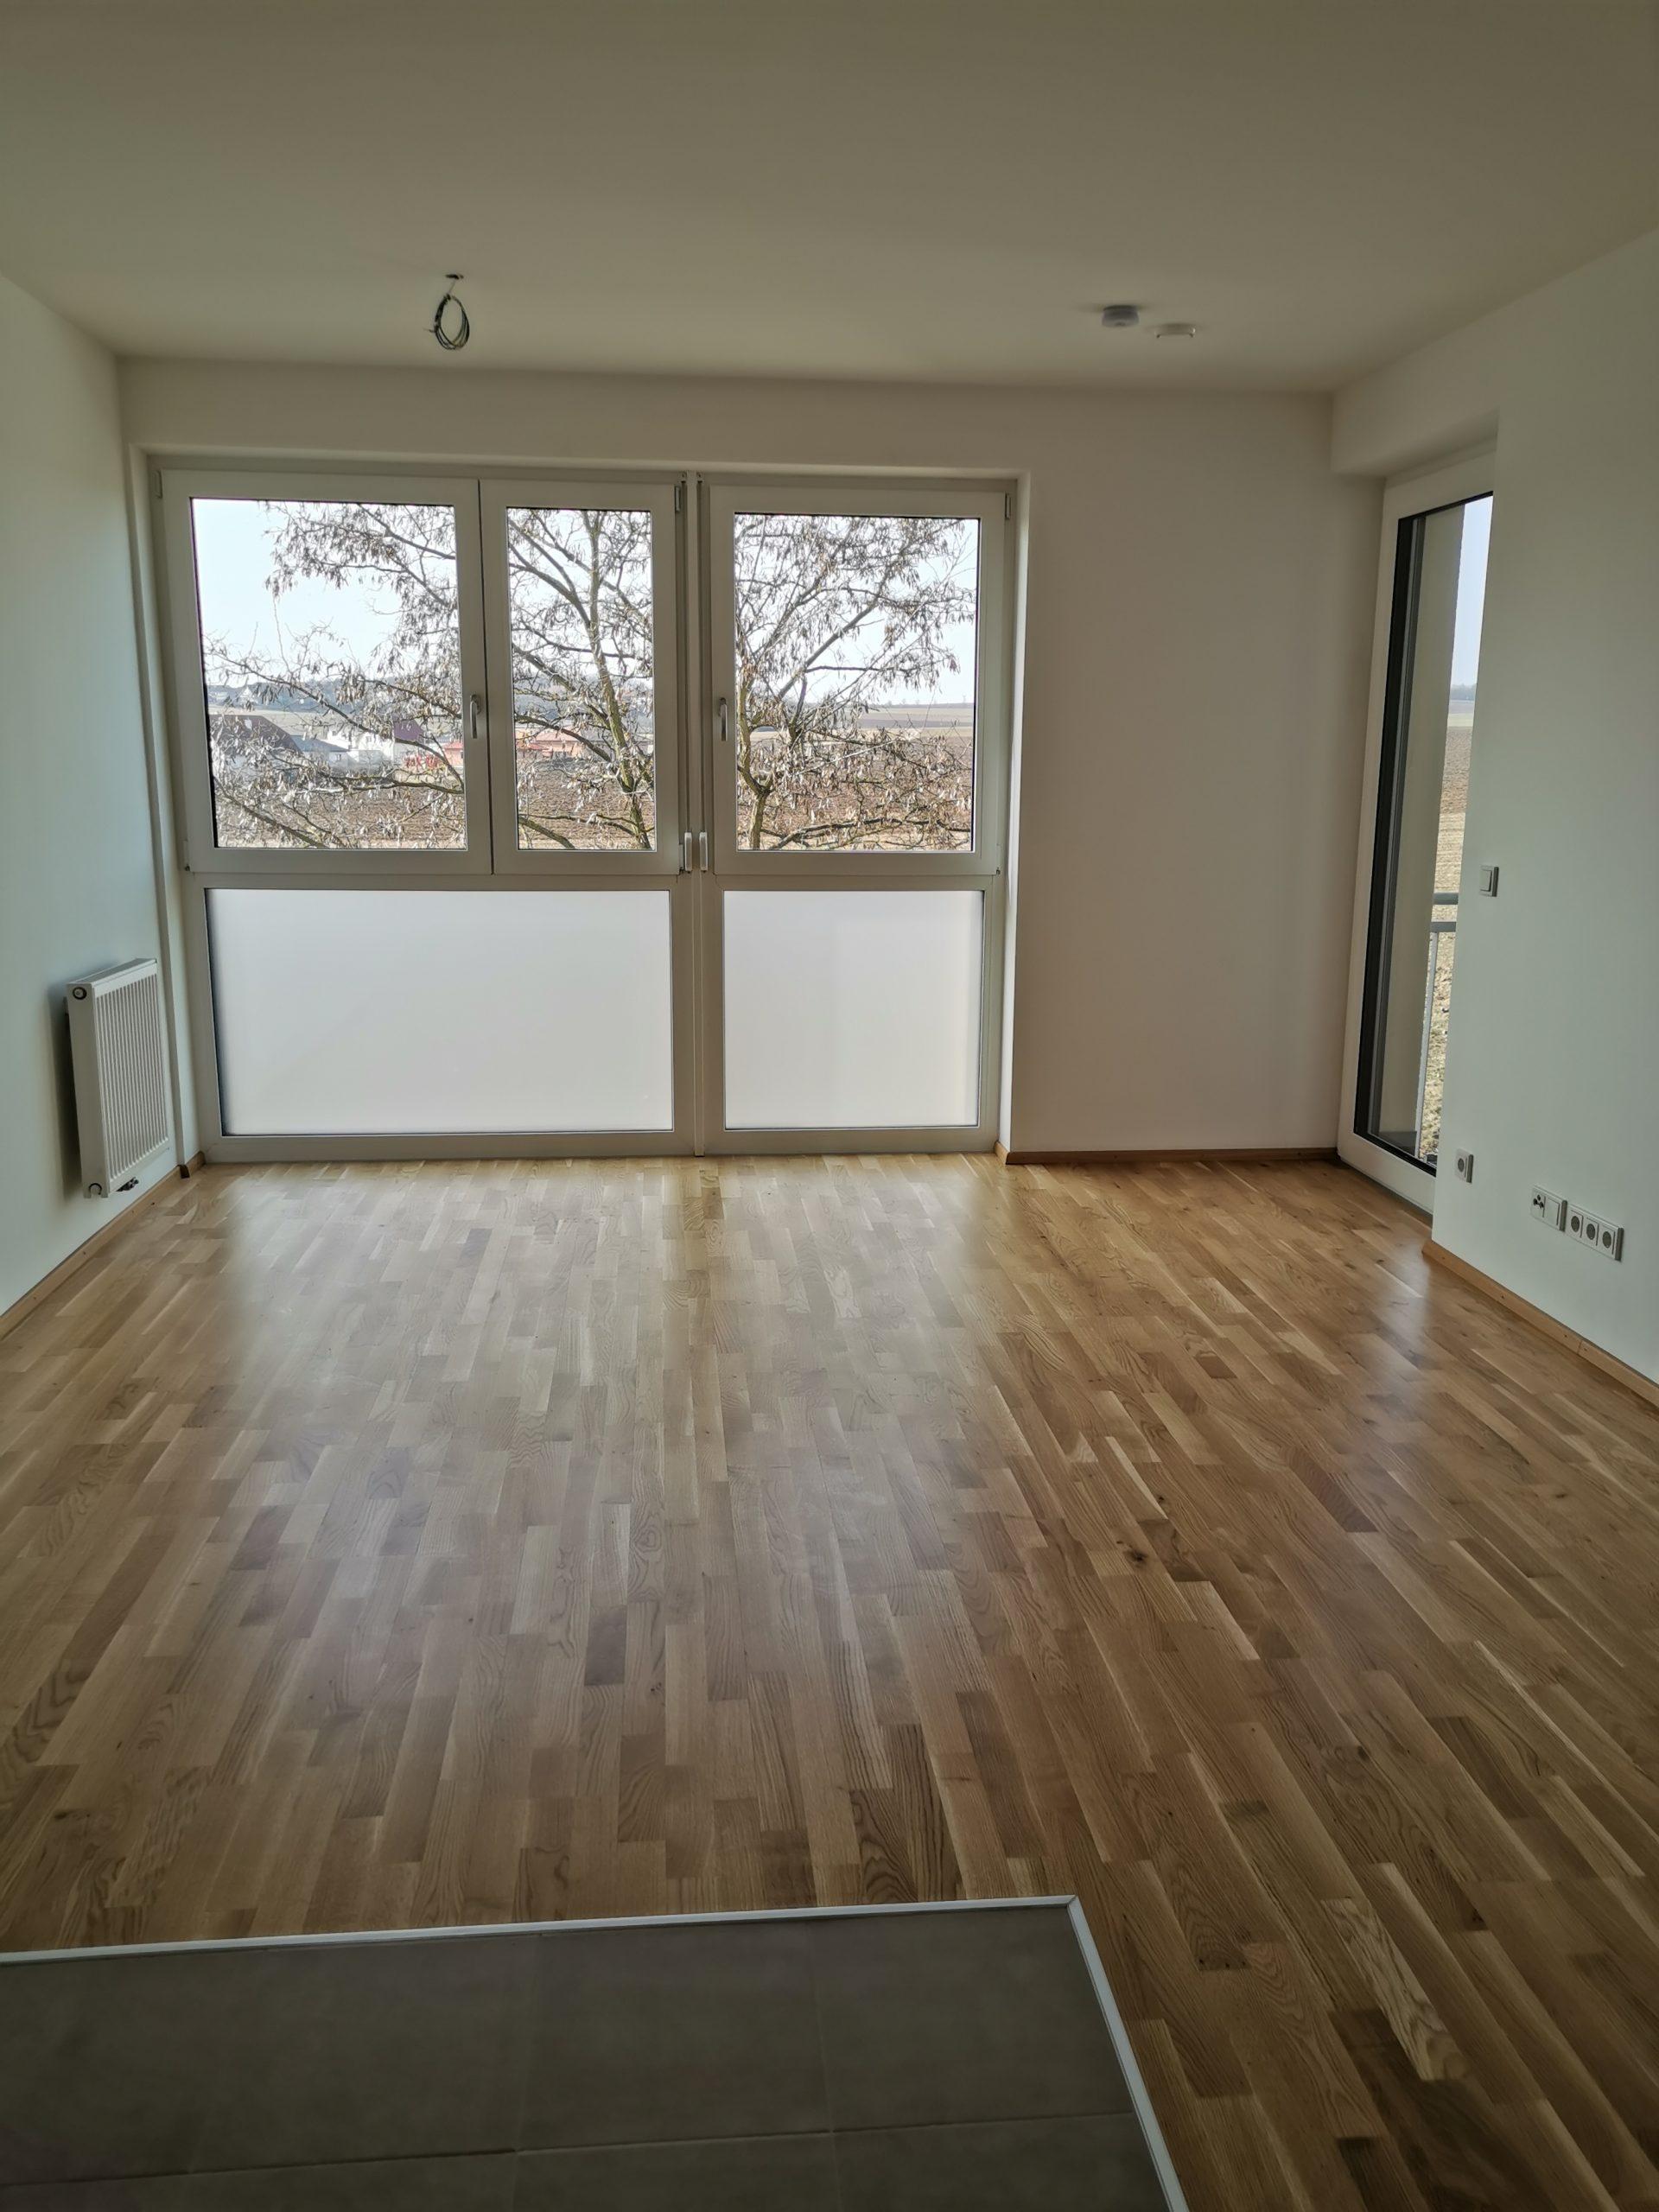 Immobilie von Kamptal in 3730 Eggenburg, Horn, Eggenburg VII - Top 106 #0